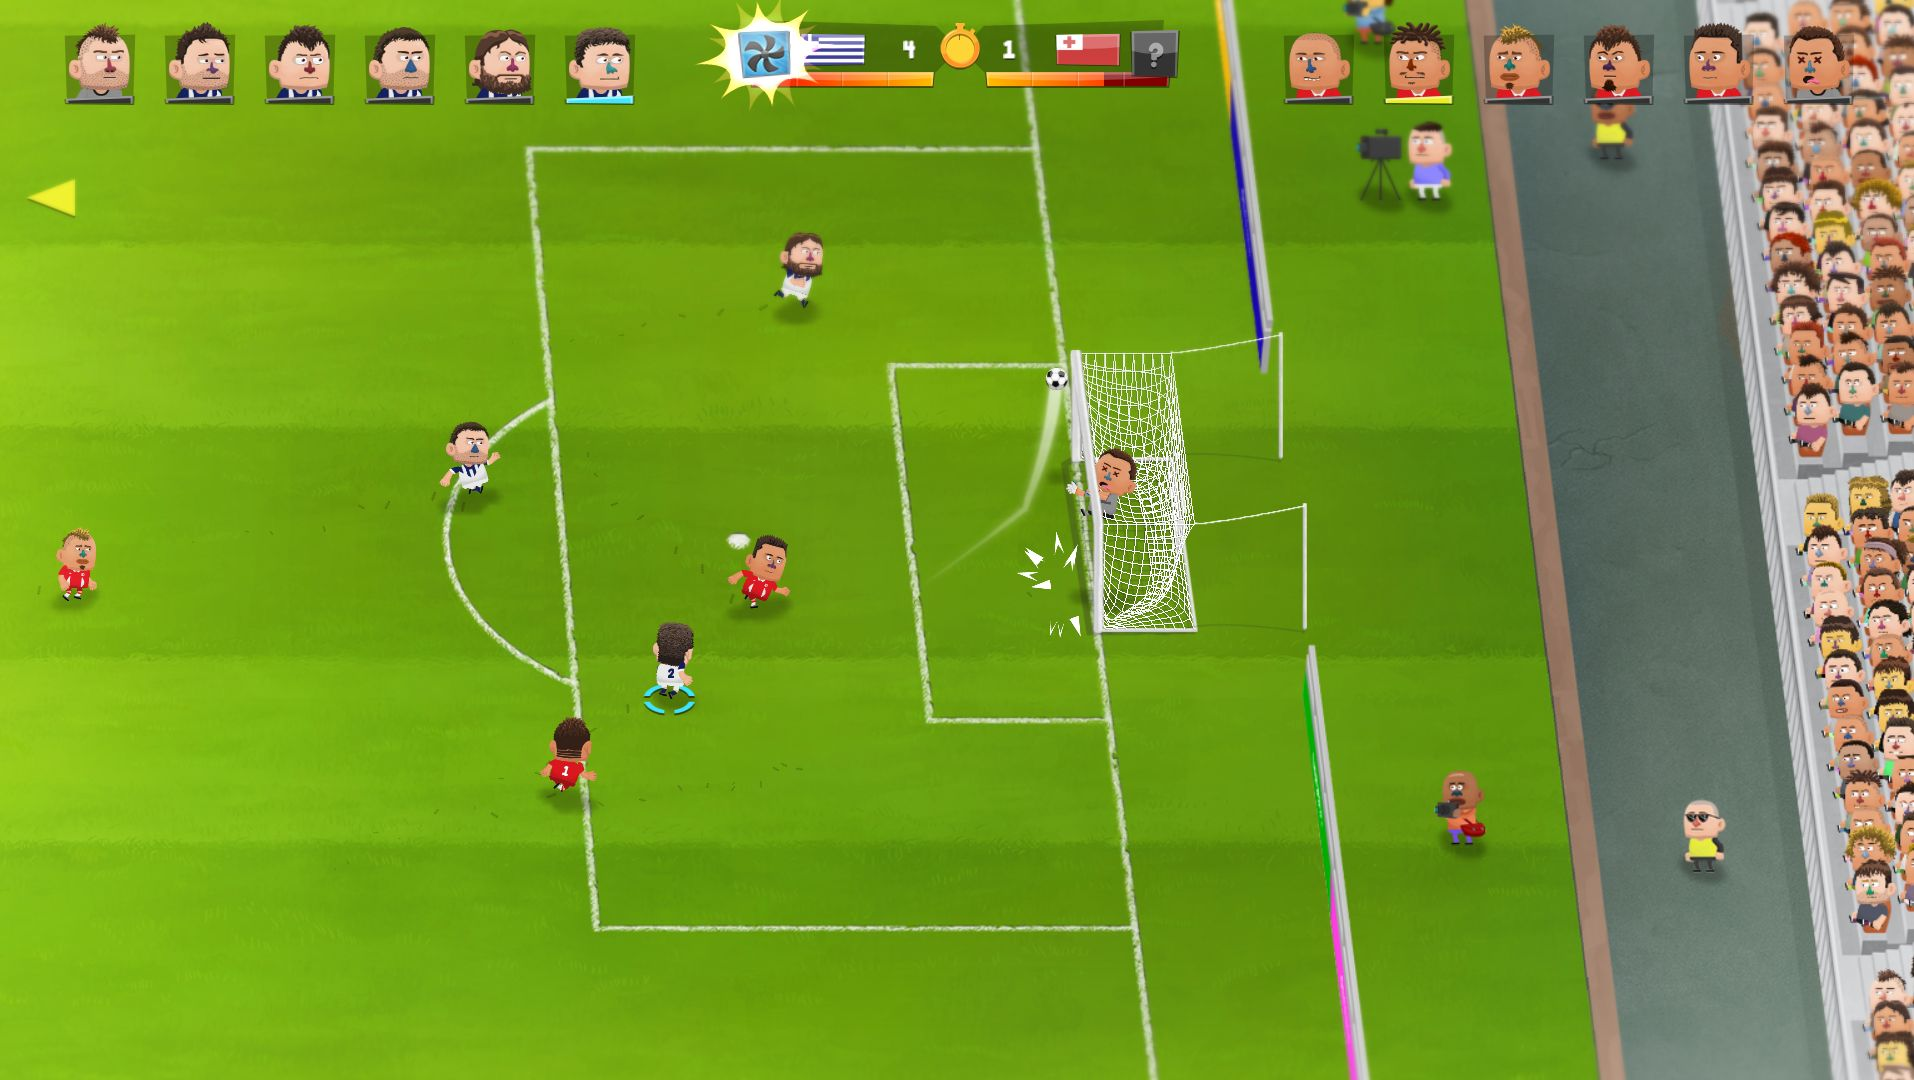 Demos: PC: Kopanito All-Stars Soccer Demo V0.1.2